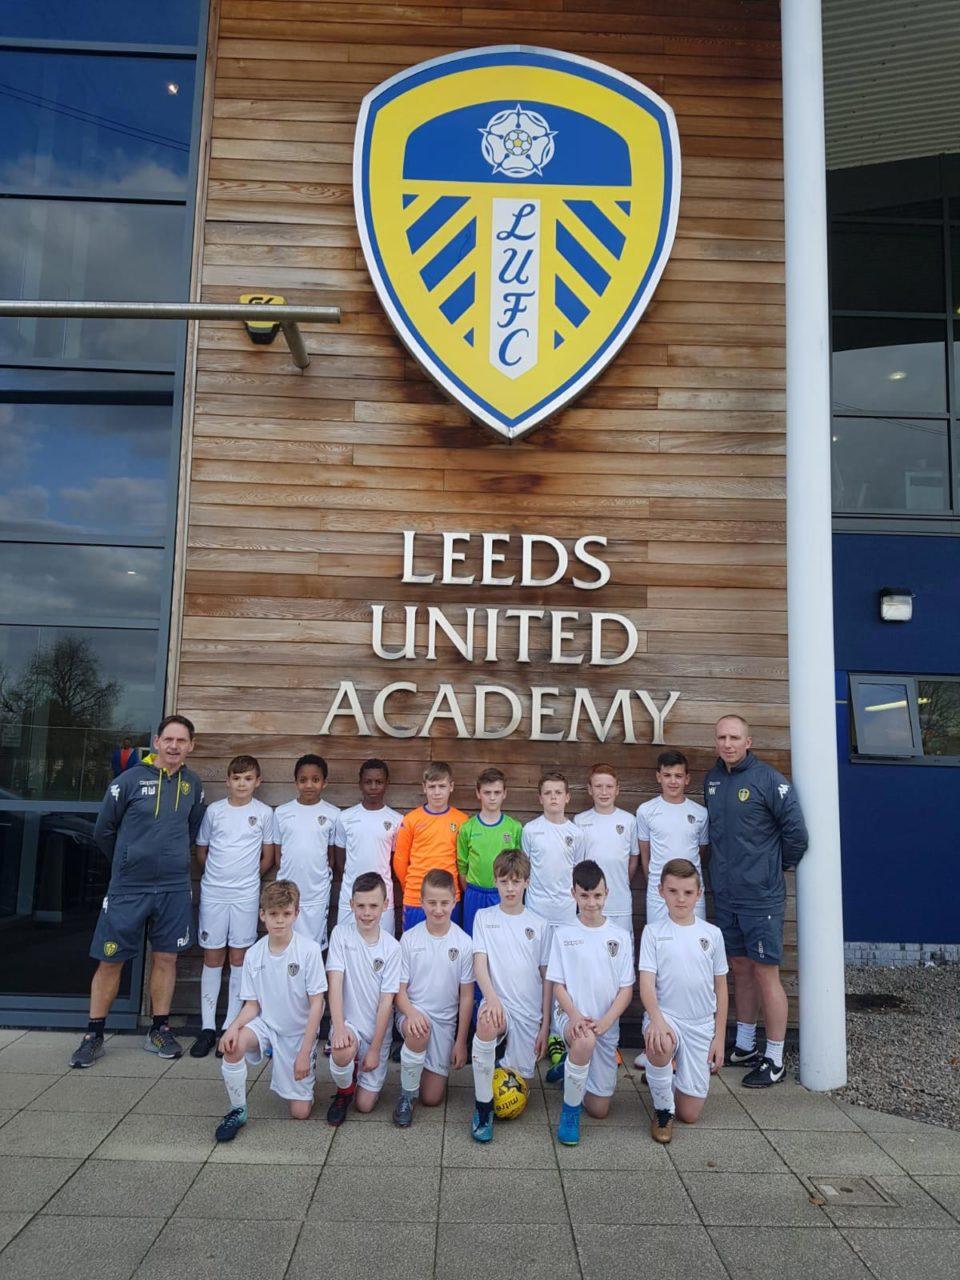 Leeds_BOYS.jpg